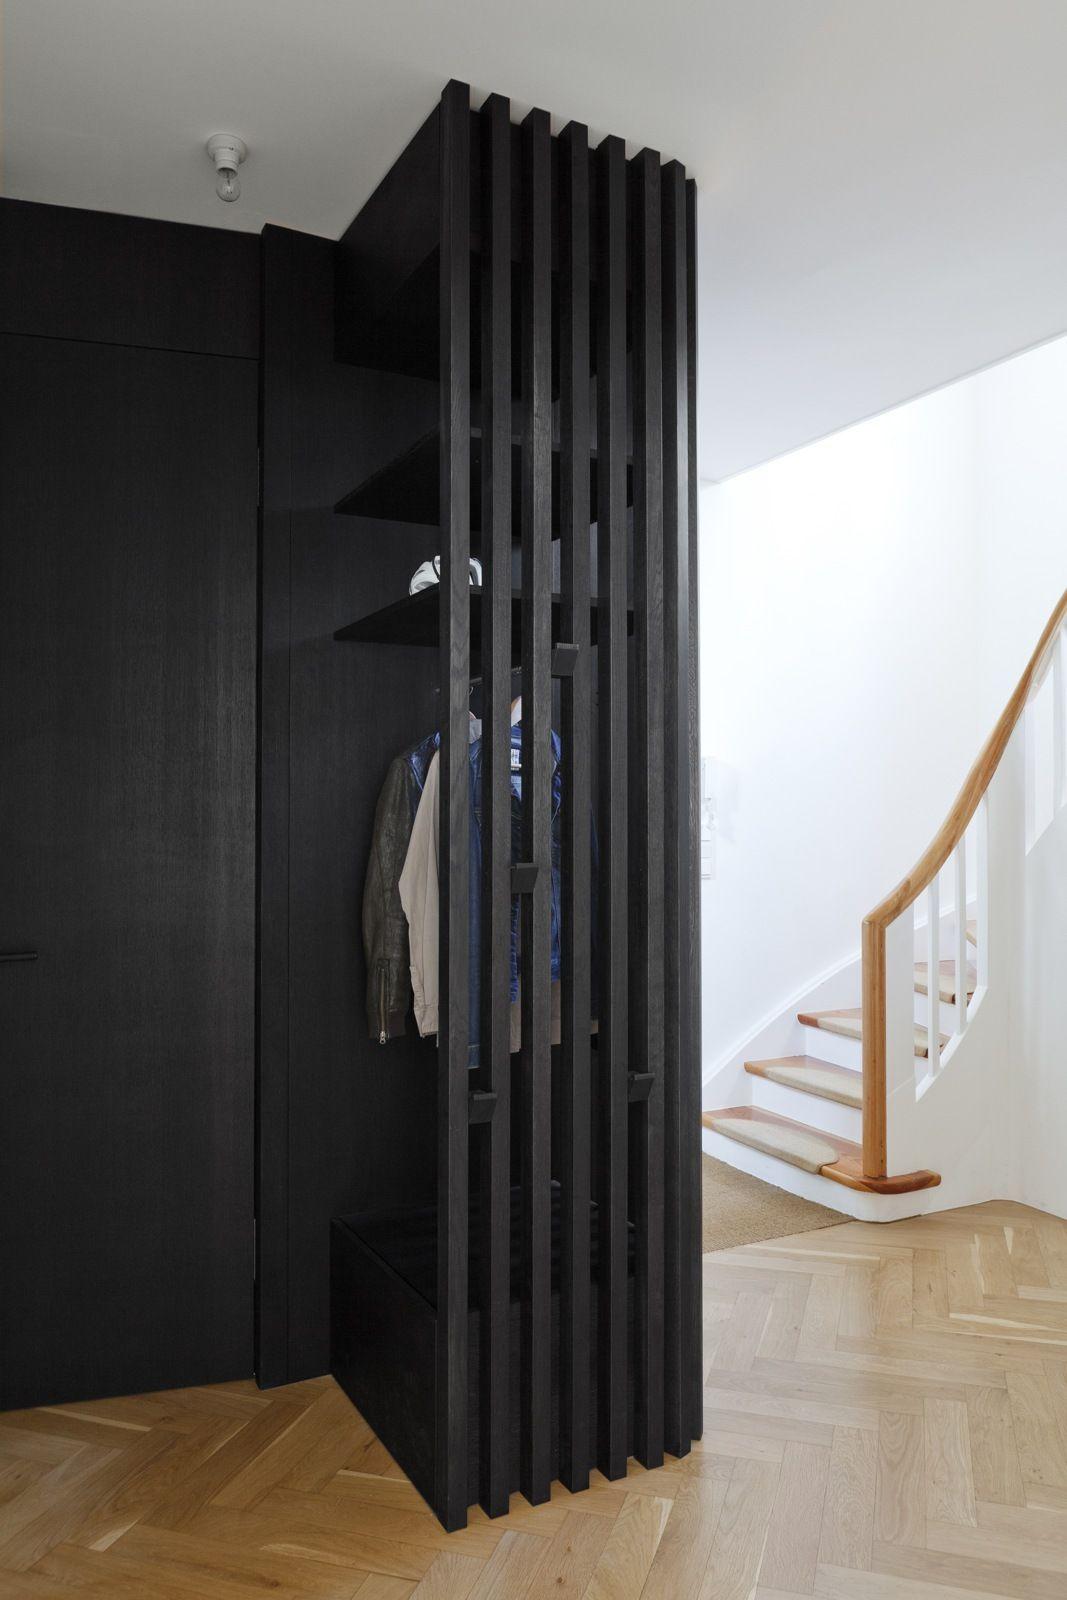 Garderoben Garderoben Garderoben In 2020 Garderobe Modern